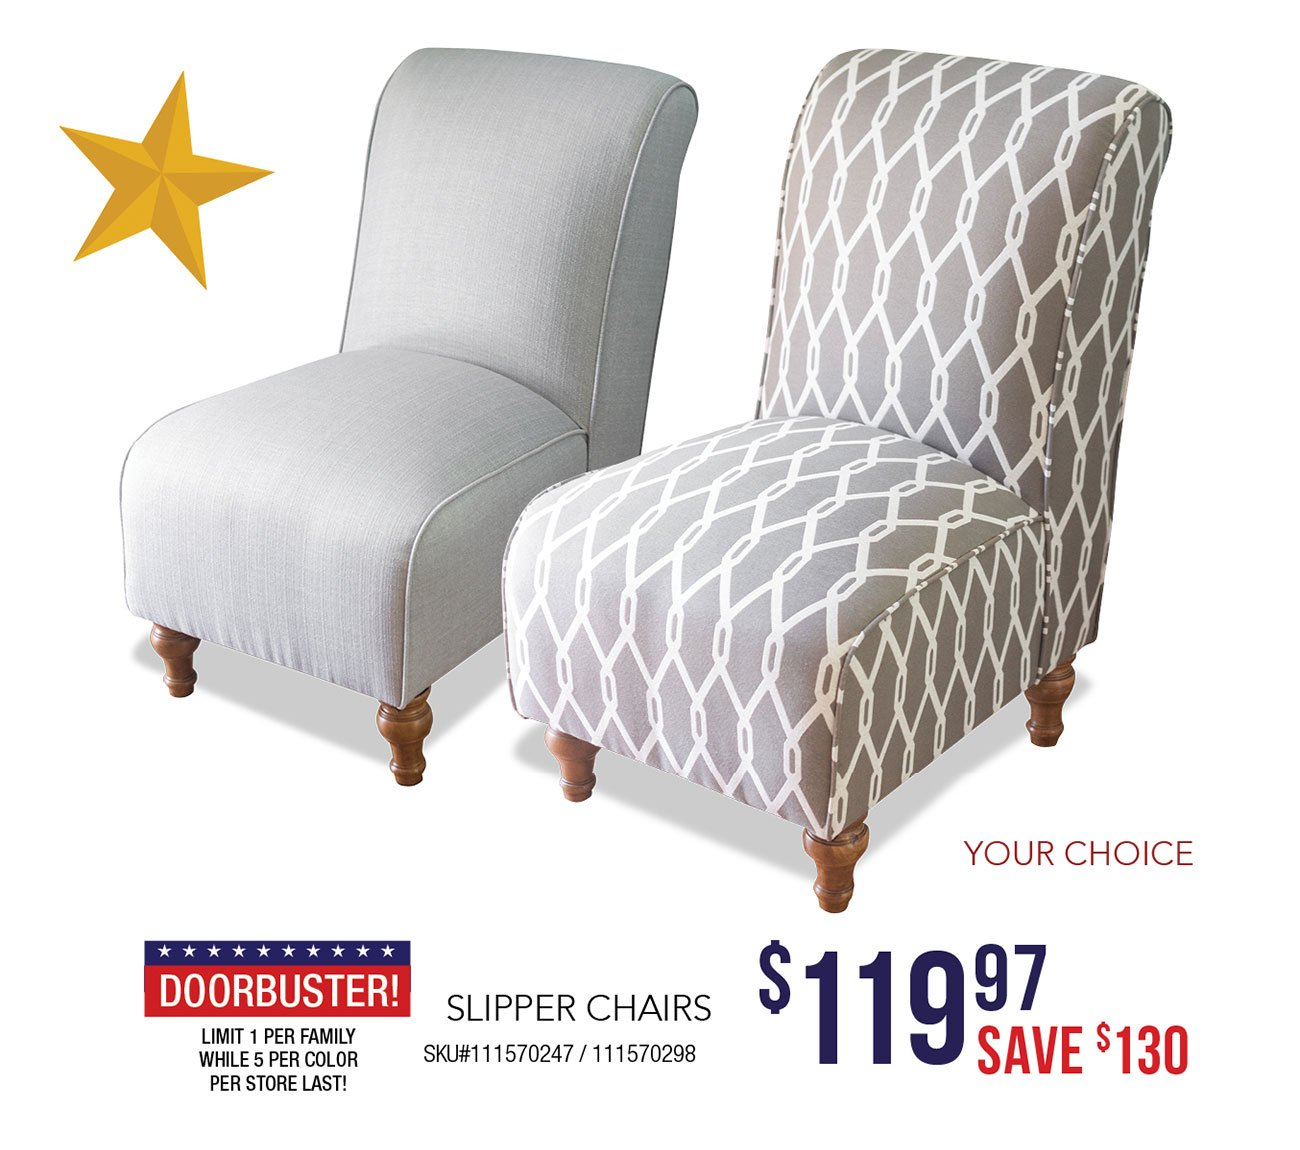 Slipper-chairs